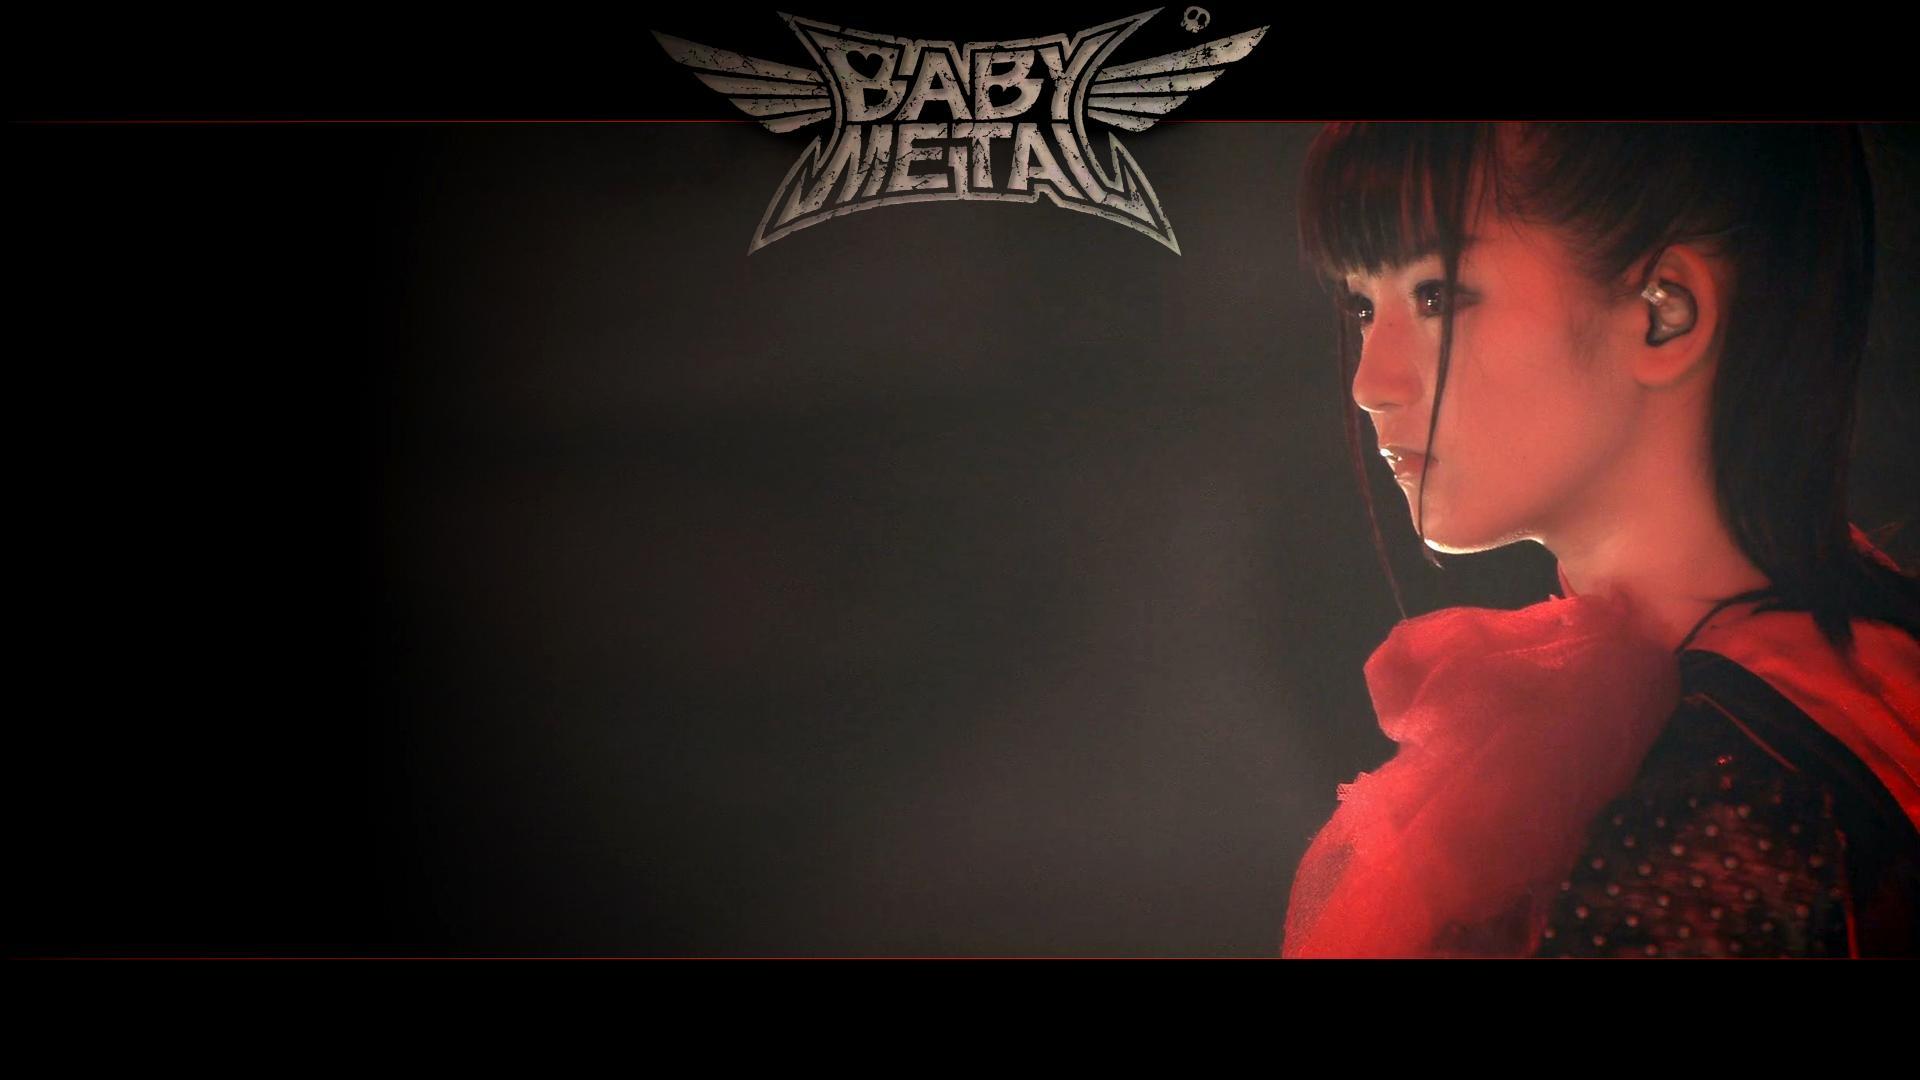 Babymetal Wallpaper 1338446 Hd Wallpaper Backgrounds Download